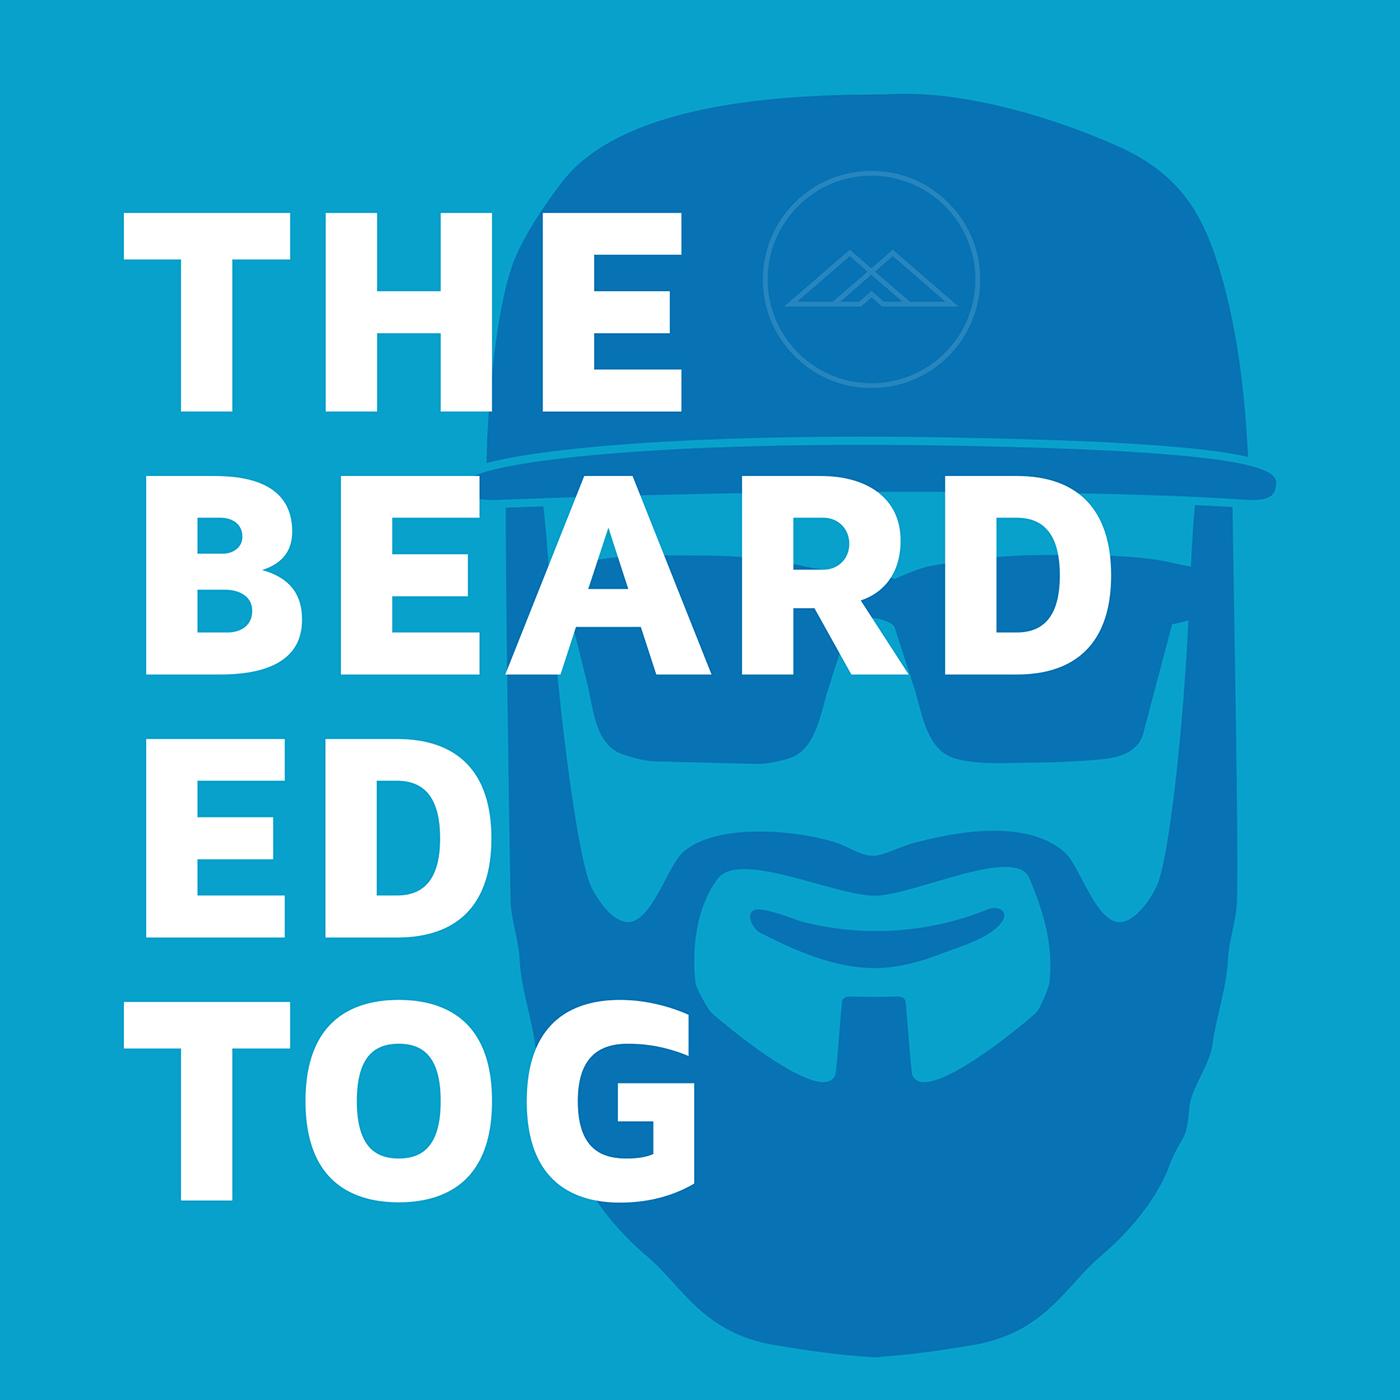 The Bearded Tog show art